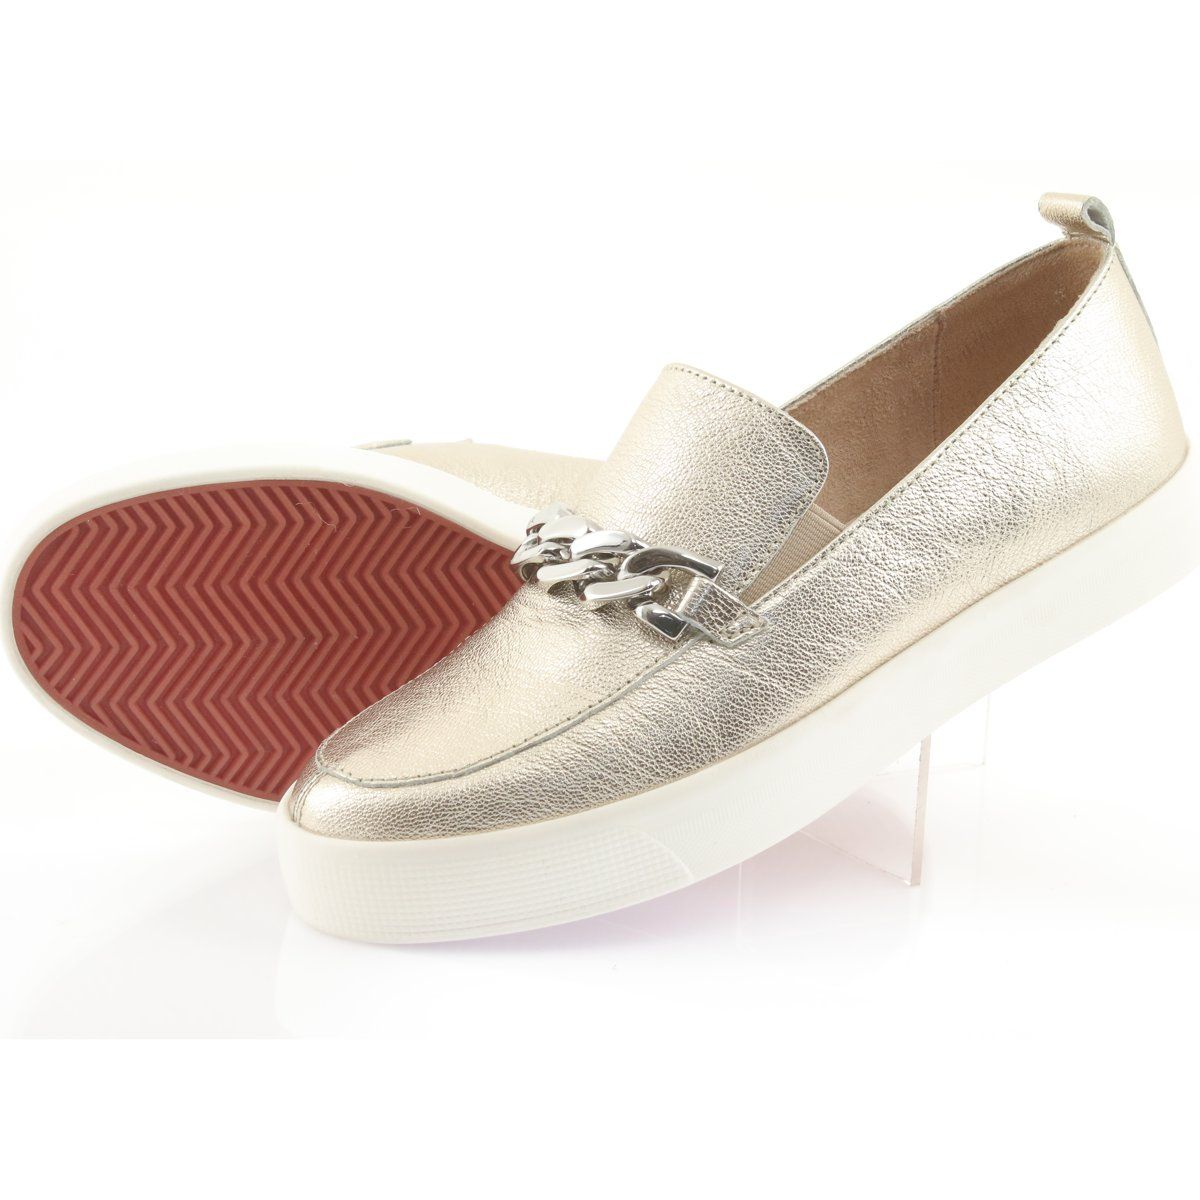 Zlote Slip On Z Lancuszkiem Caprice 24200 Zloty Slip On Shoes Loafers